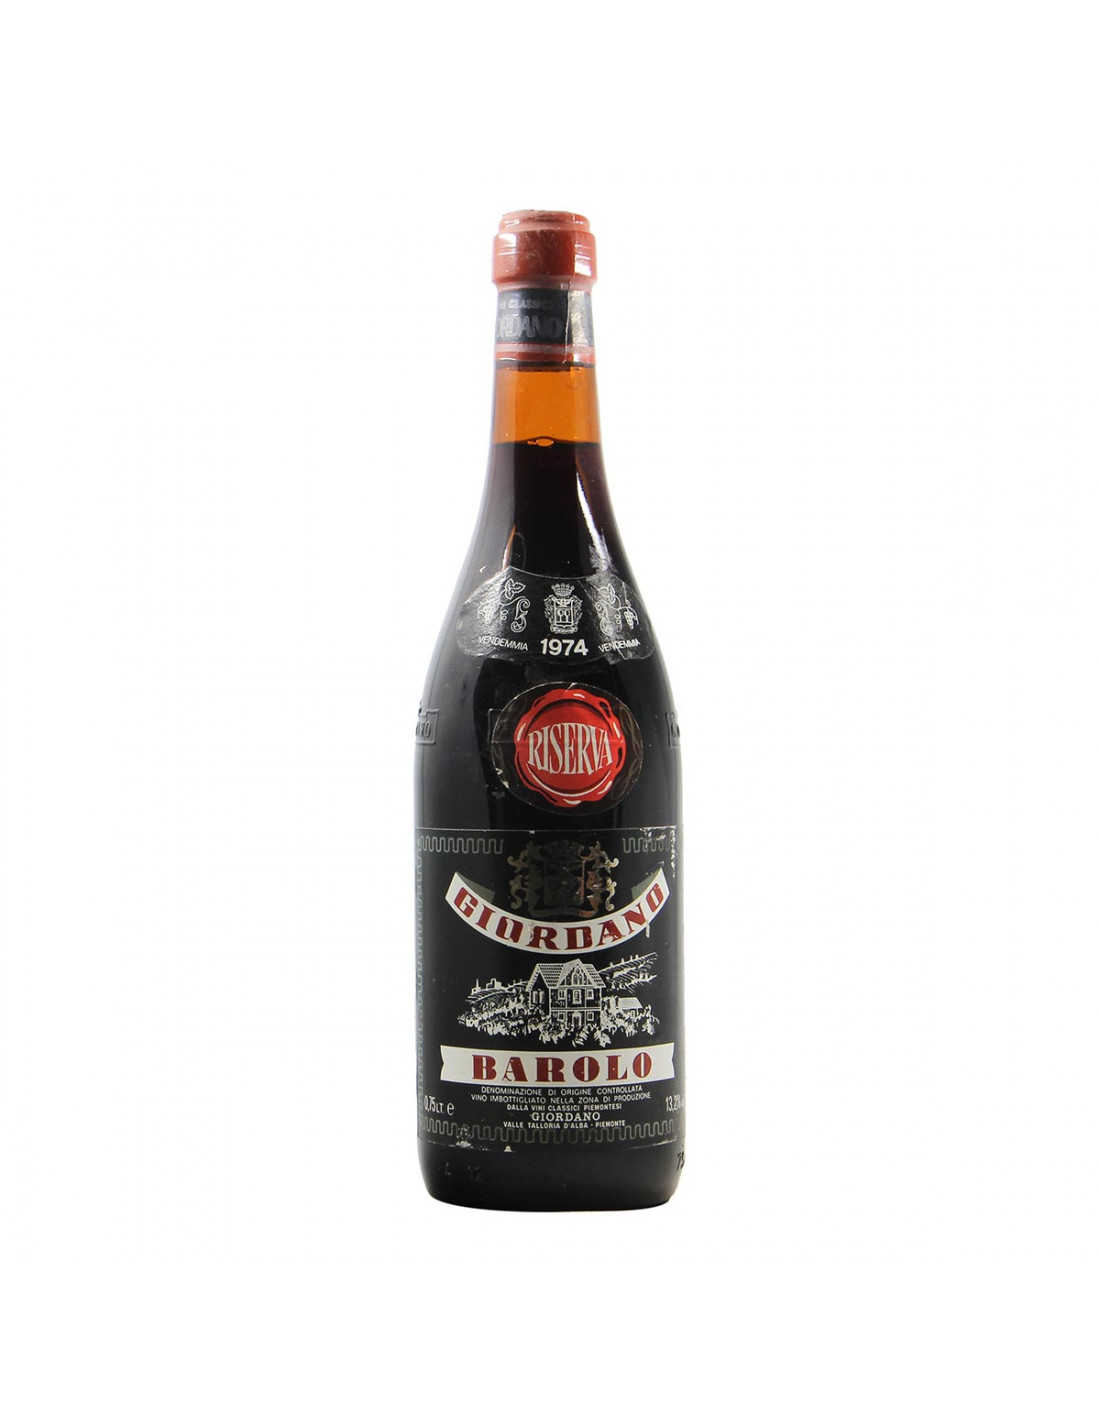 Giordano Barolo Riserva 1974 Grandi Bottiglie